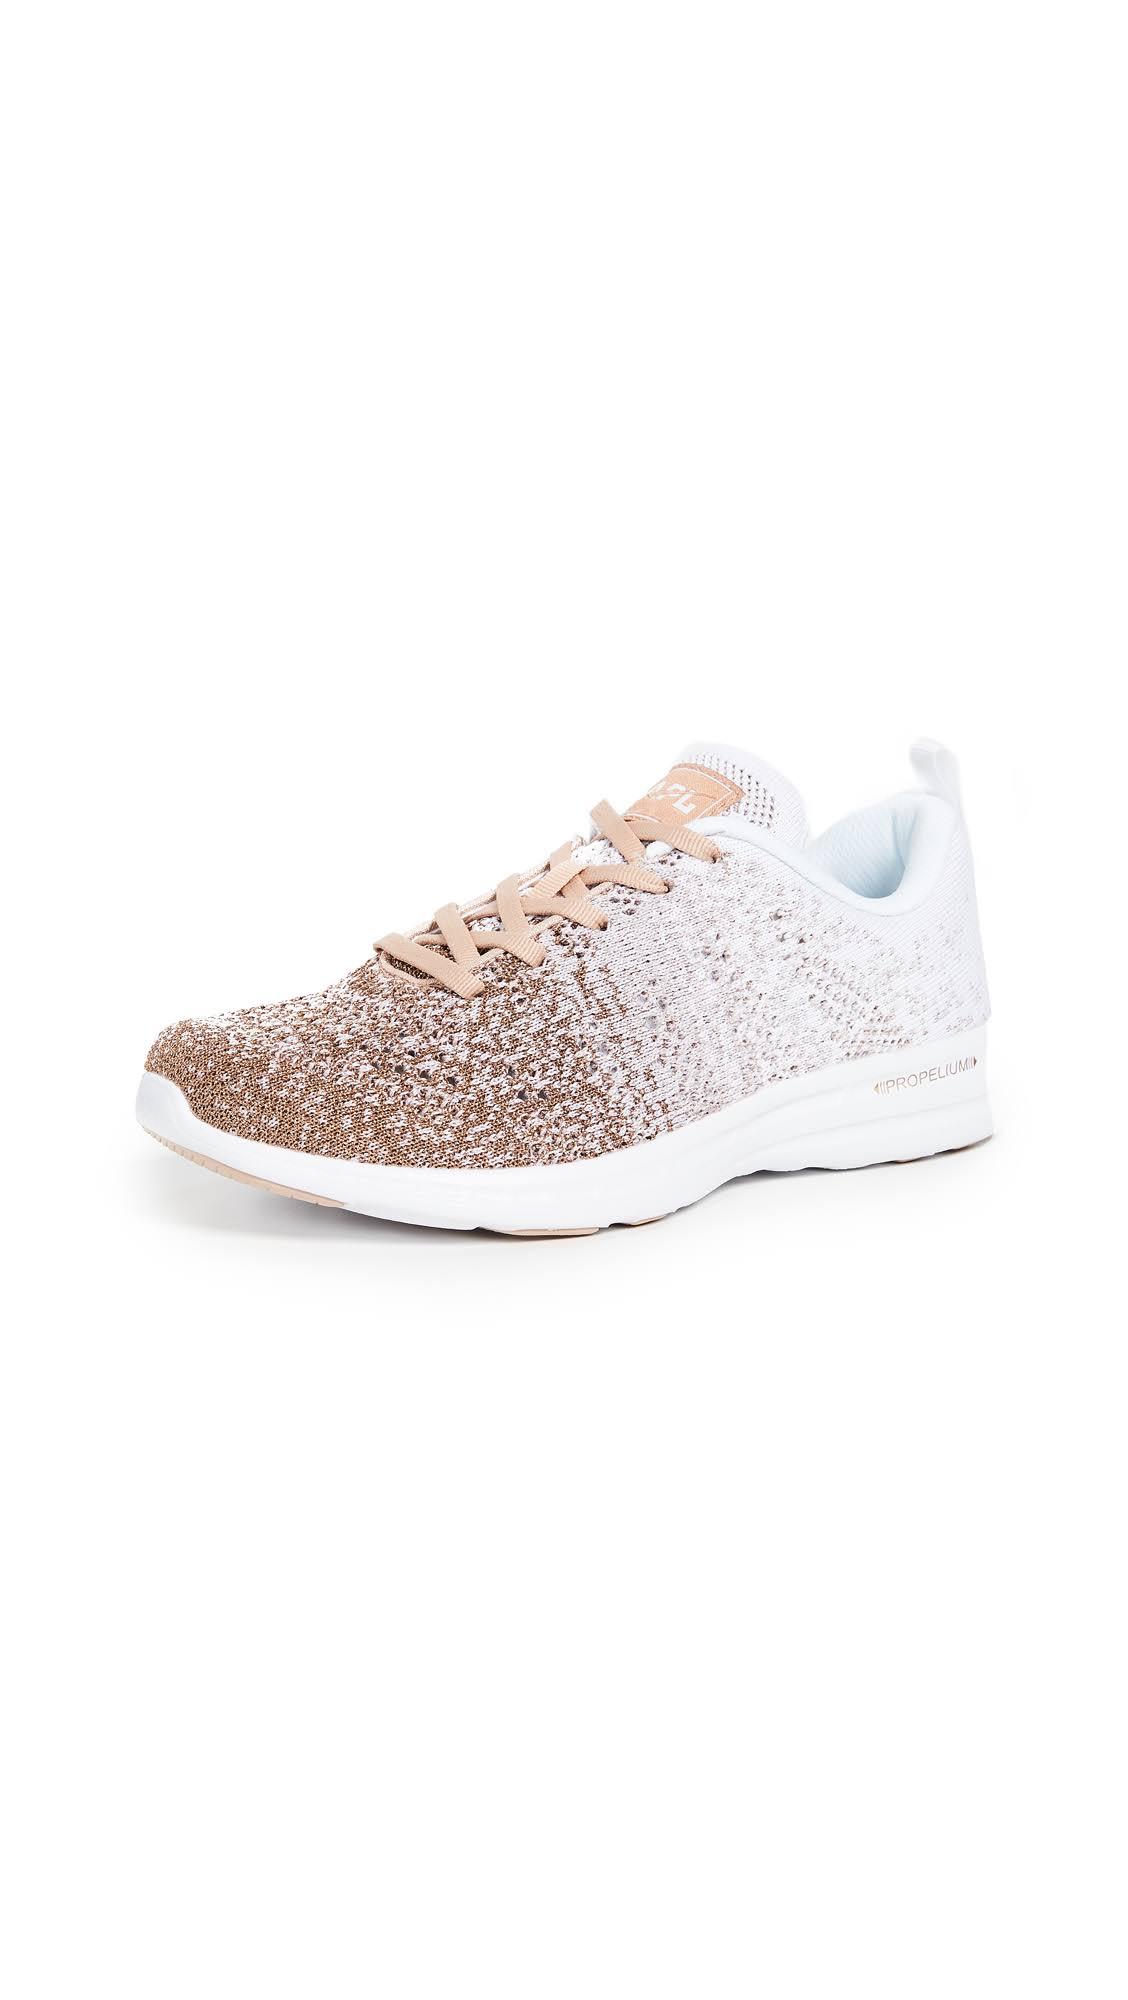 Pro Labs Sneakers goudwitombre 6 AplAthletic Rose Propulsion Techloom PuZiXk